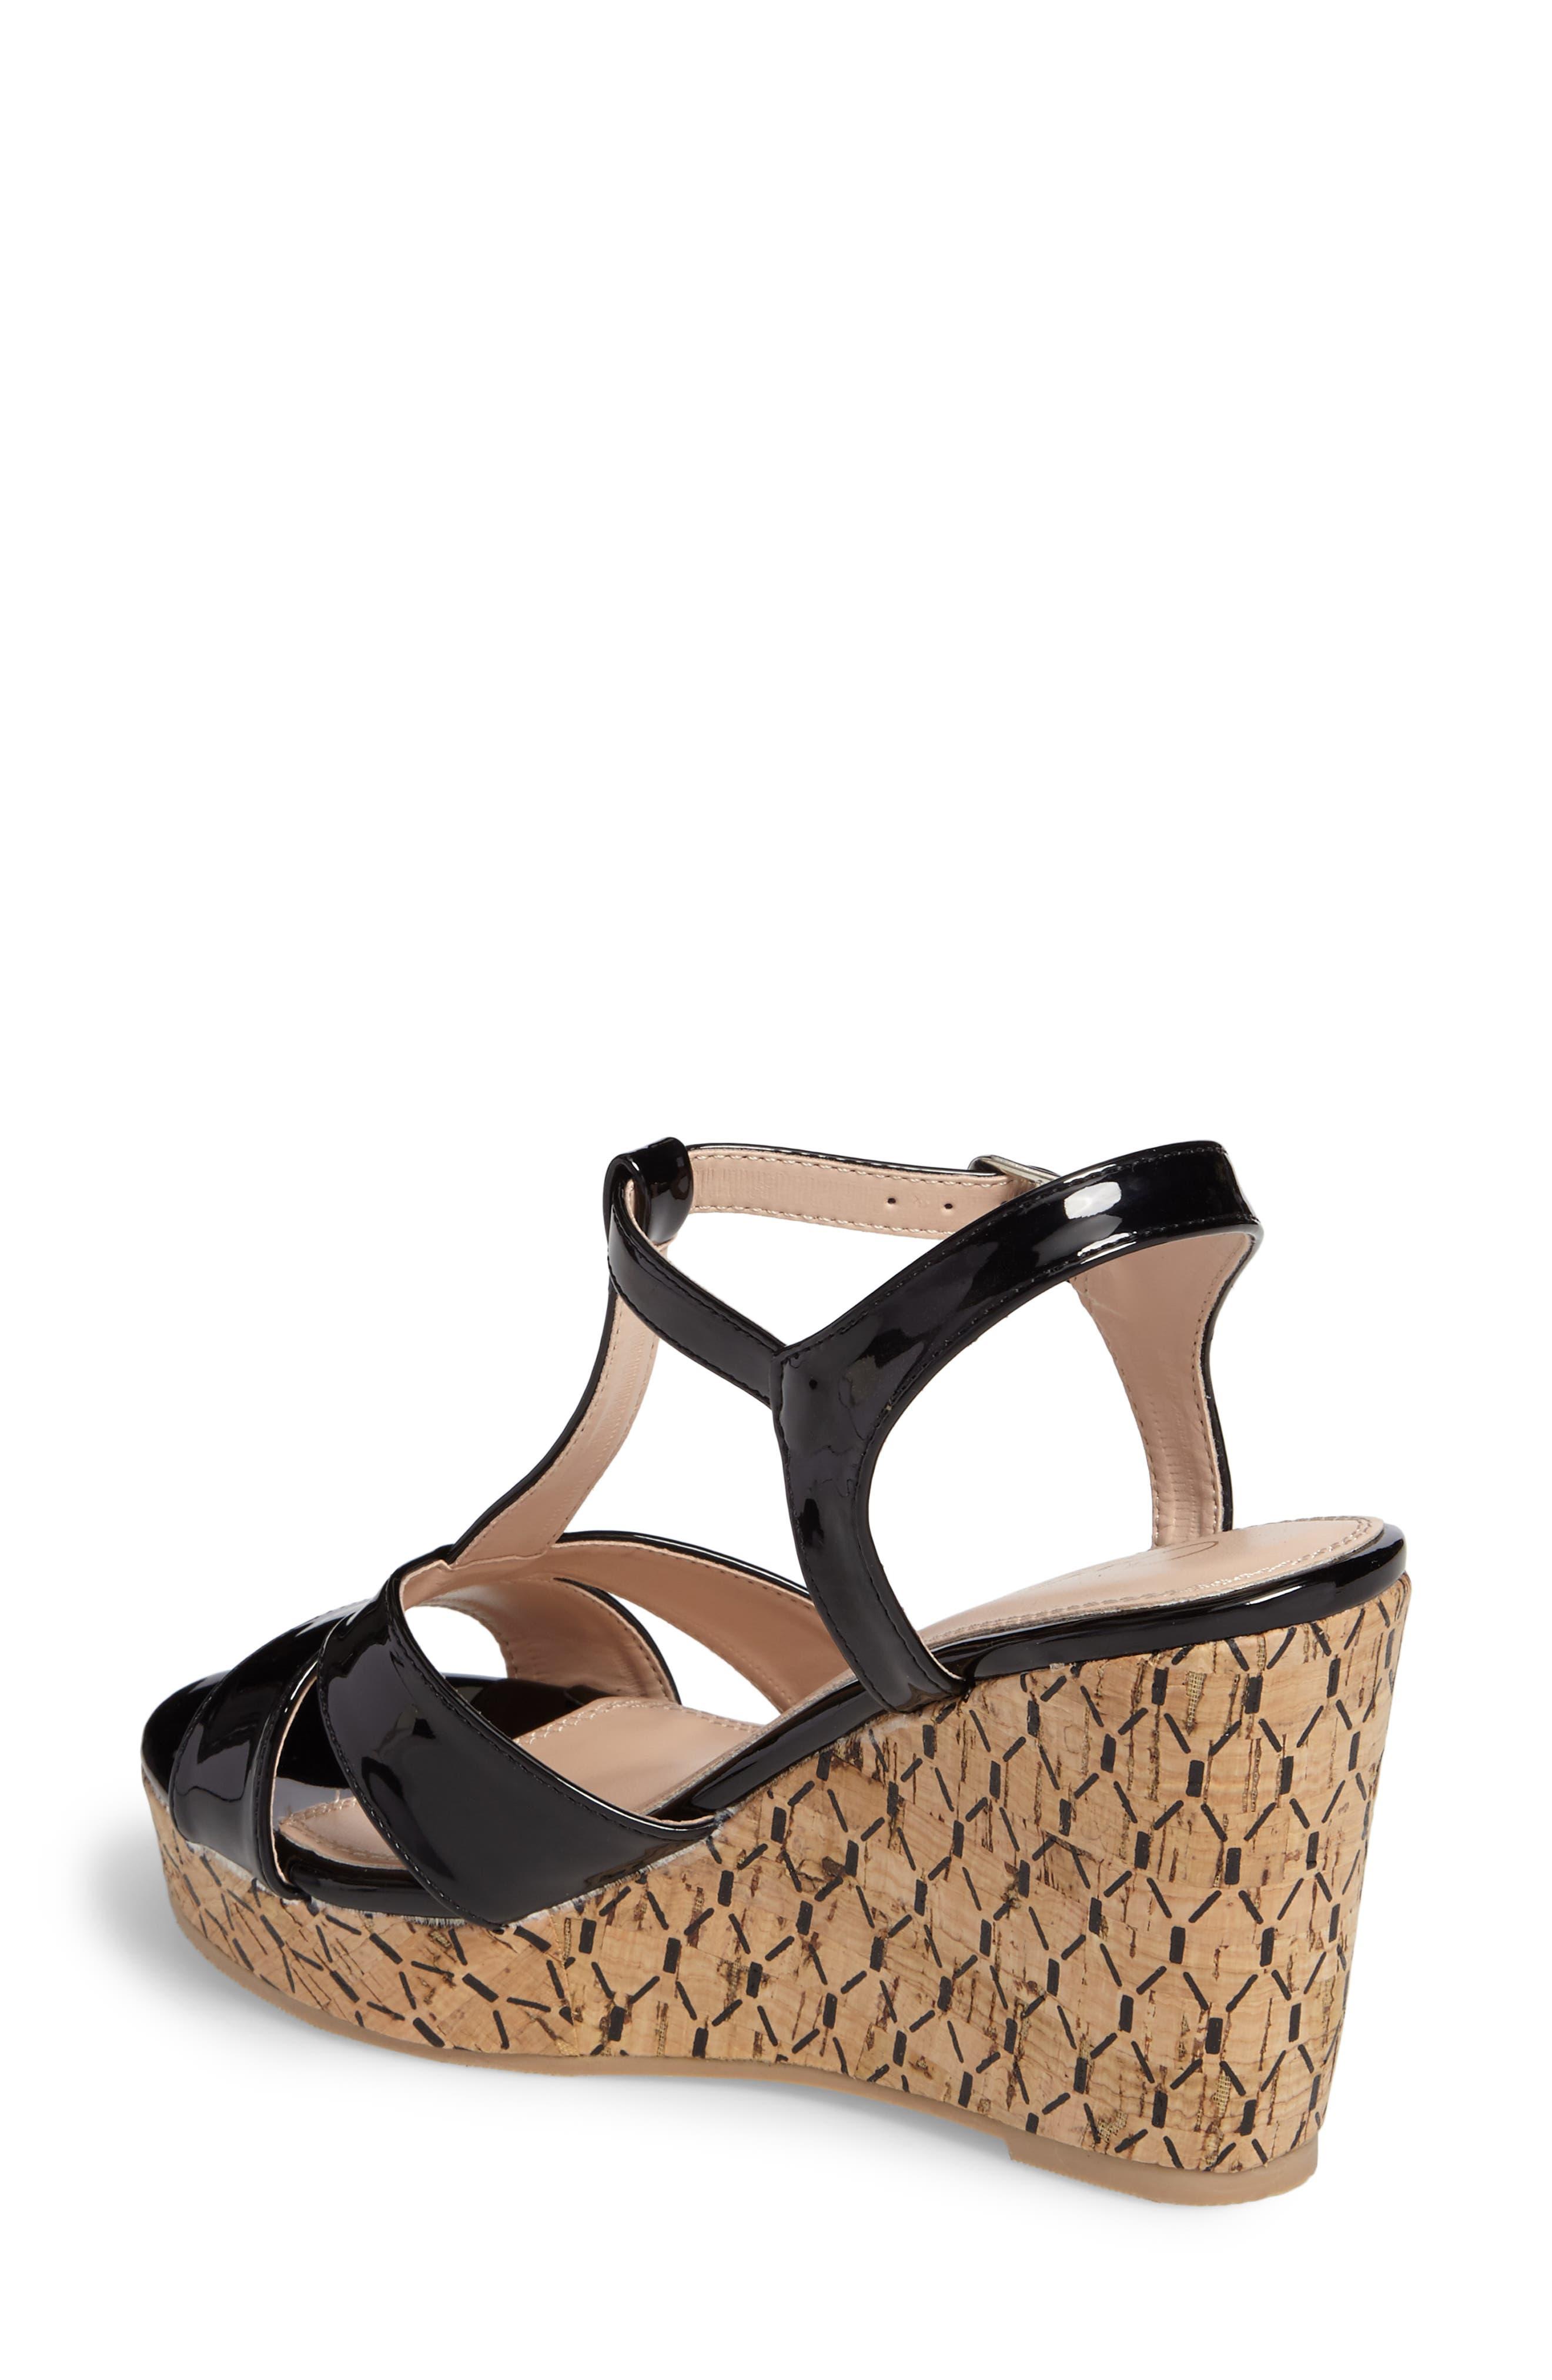 Teluride Platform Wedge Sandal,                             Alternate thumbnail 2, color,                             BLACK SYNTHETIC PATENT